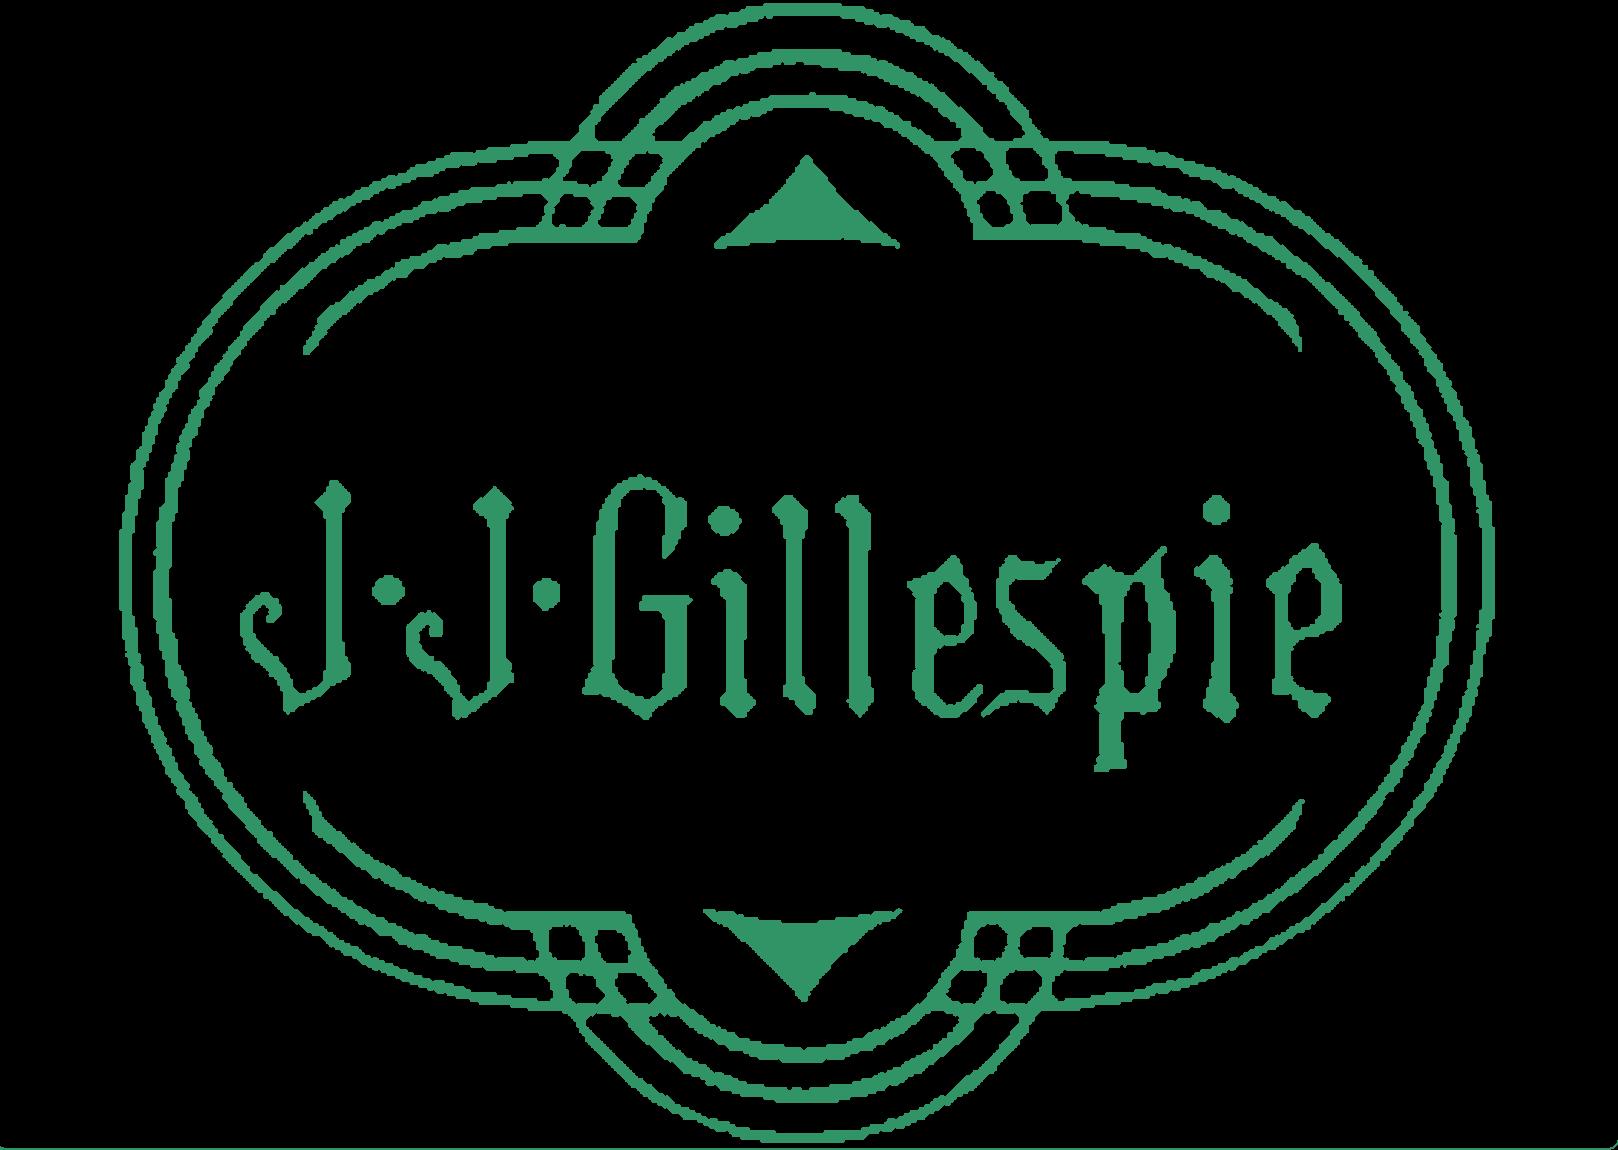 J.J. Gillespie Gallery